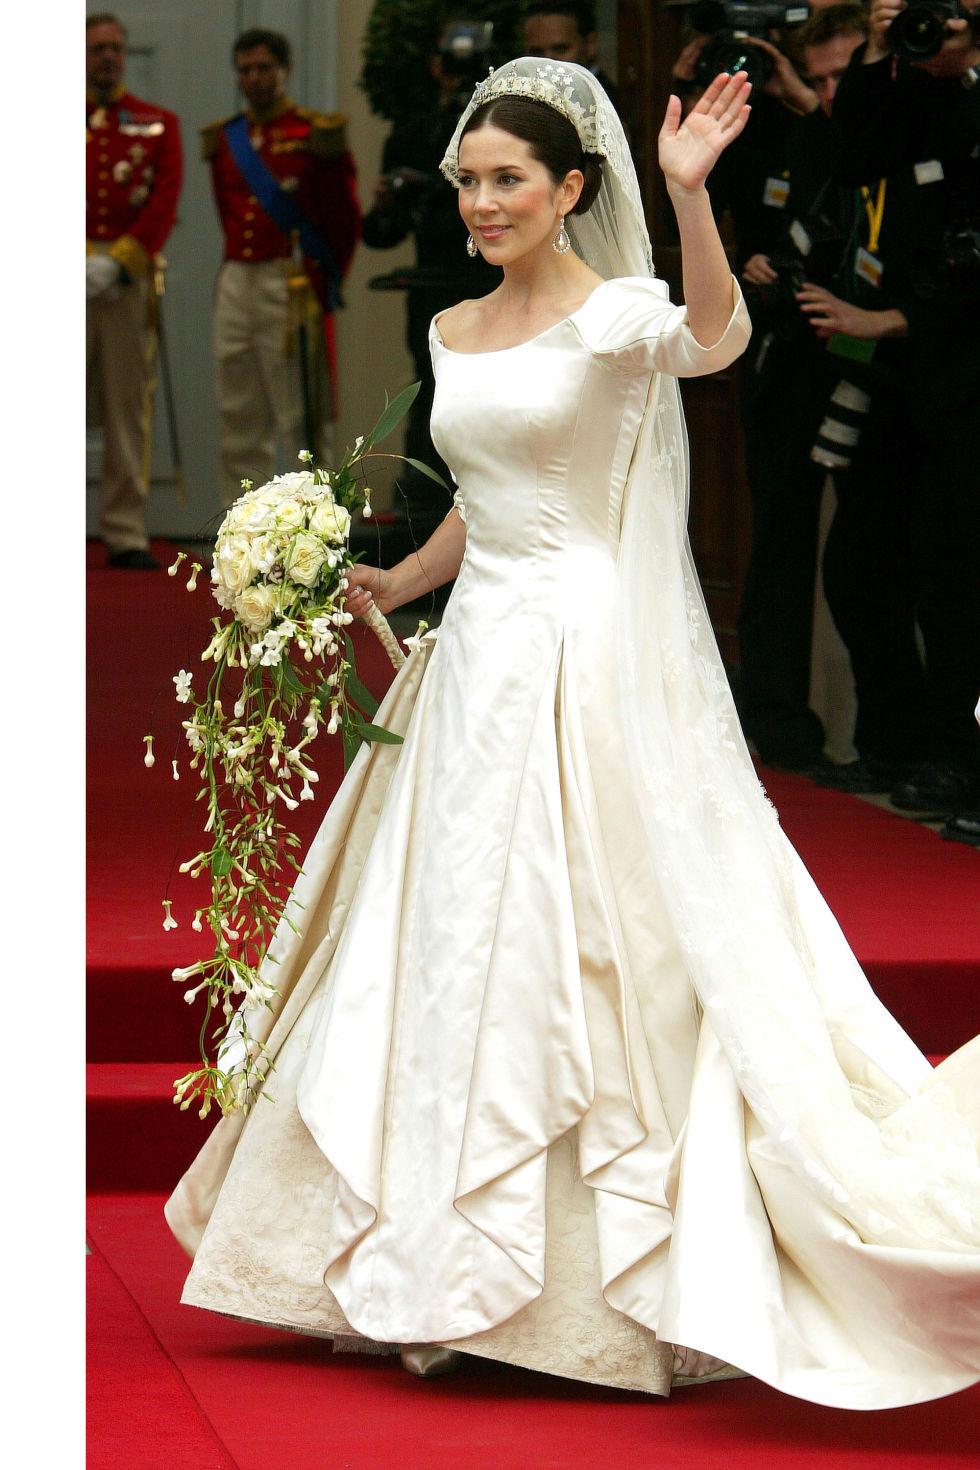 british wedding dresses photo - 1